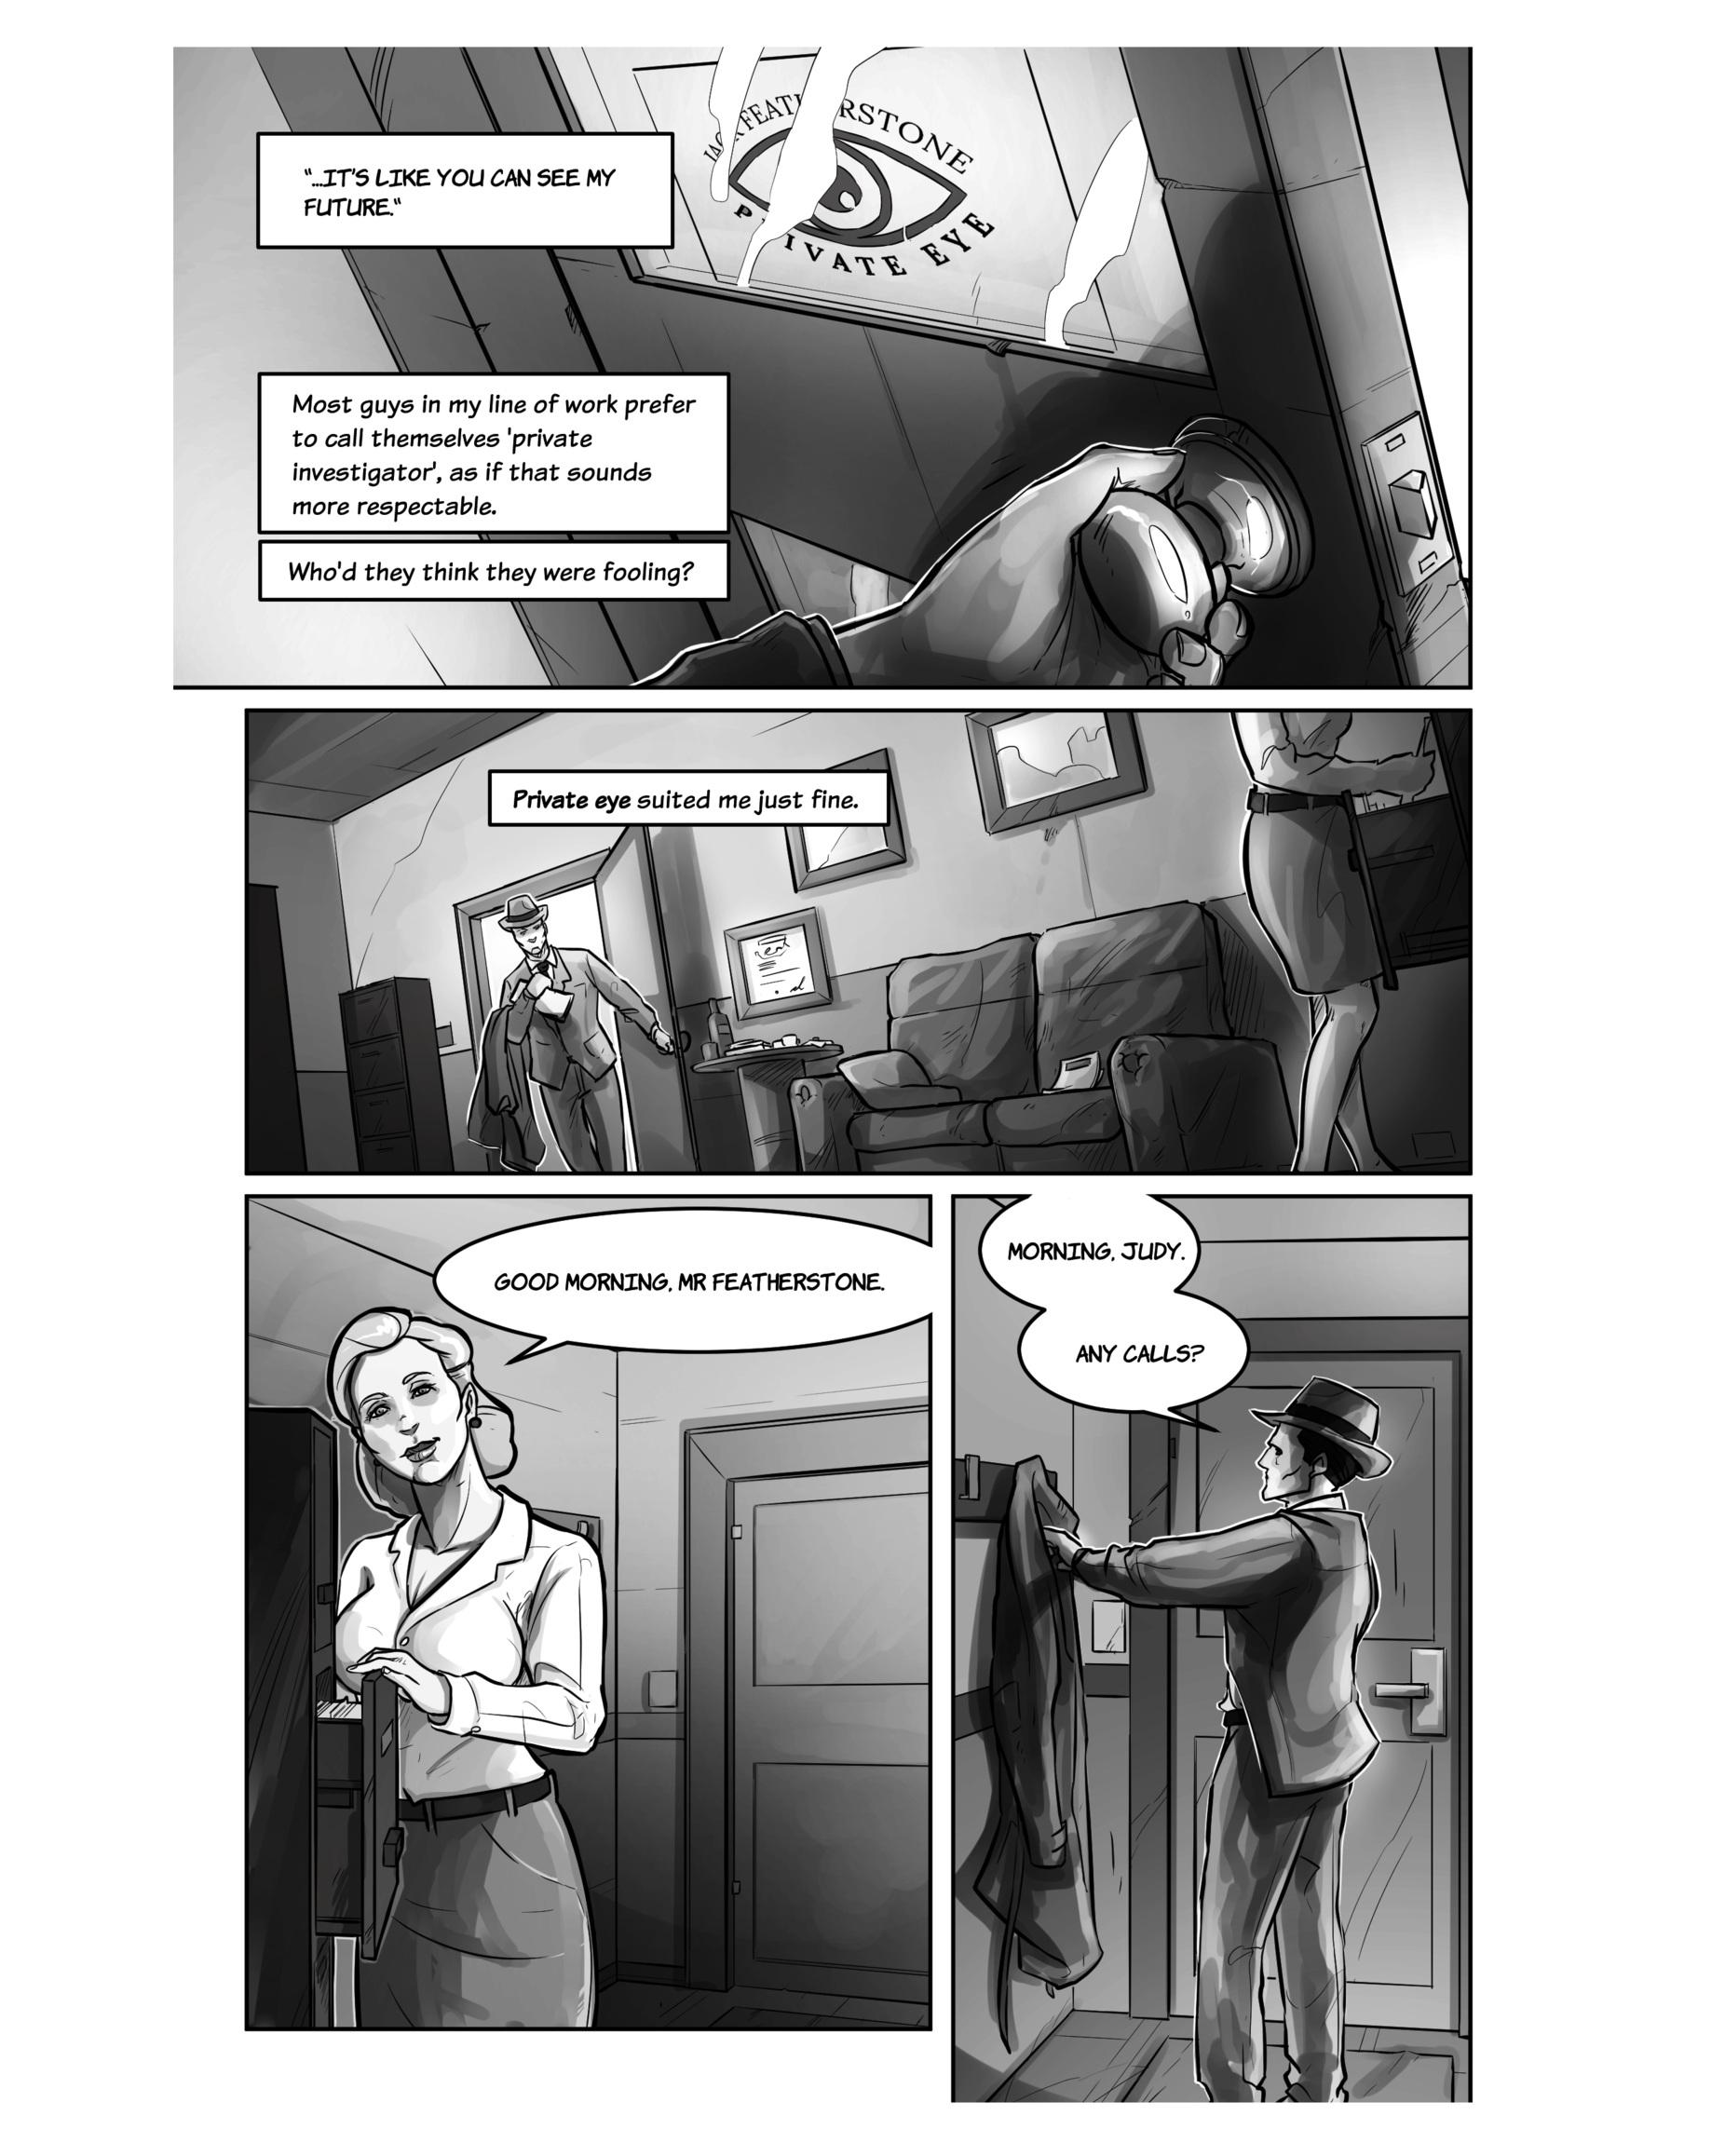 owatw_1+PAGE+10+WEB.jpg